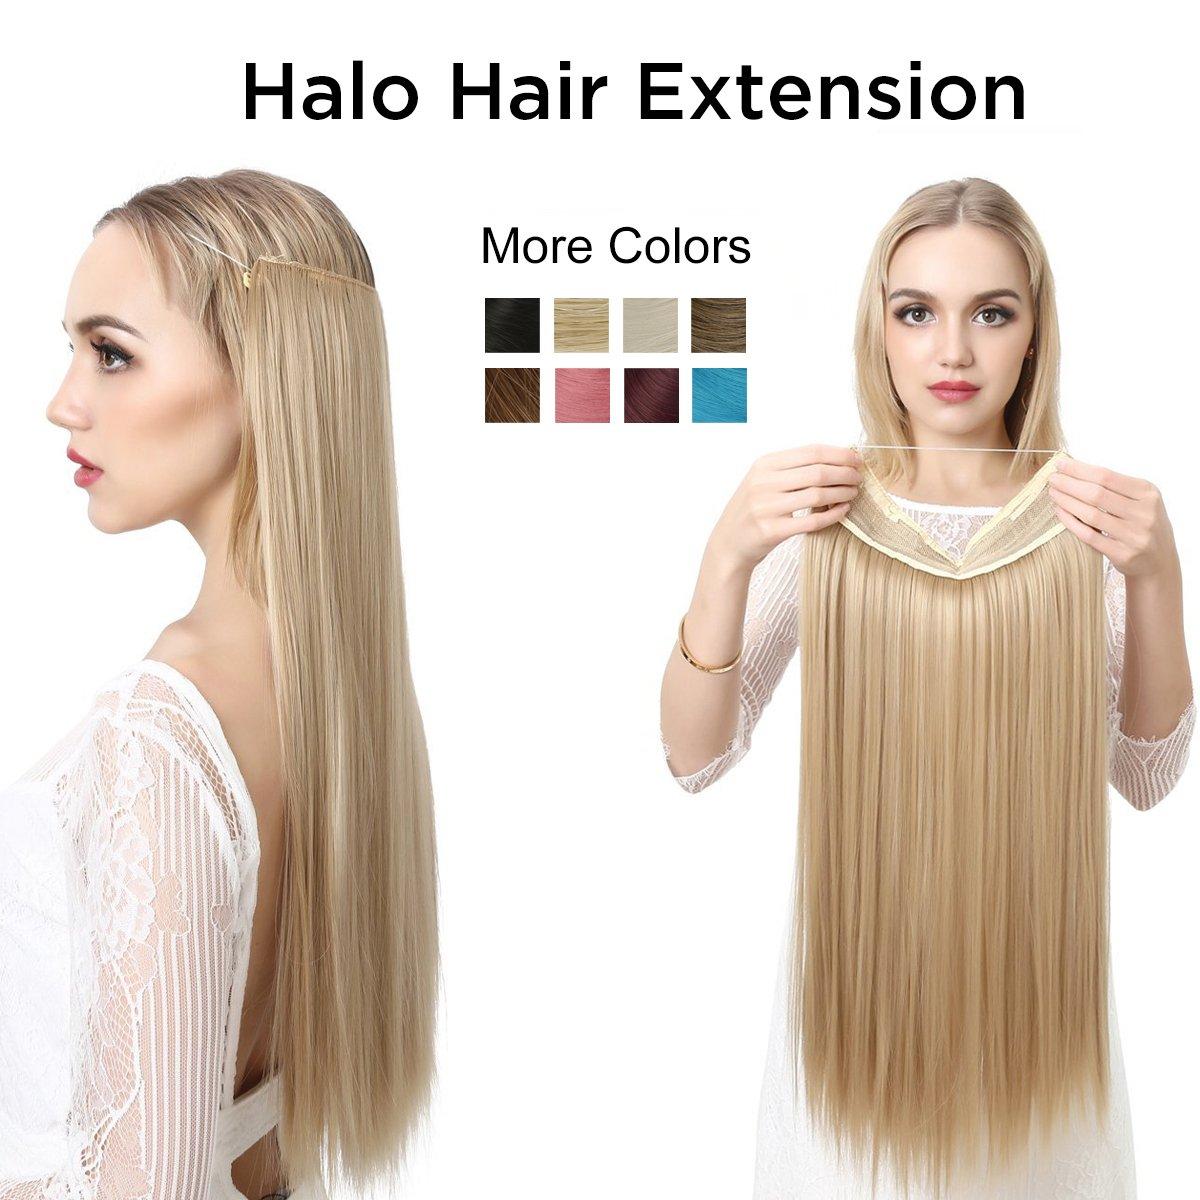 "SARLA Secret Extension Long 22"" Straight Halo Hair Extensions Flip in Natural Synthetic Hair Pieces For Women Hairpiece Hidden Wire Crown Headband Heat Friendly Fiber (M02#33 dark auburn)"